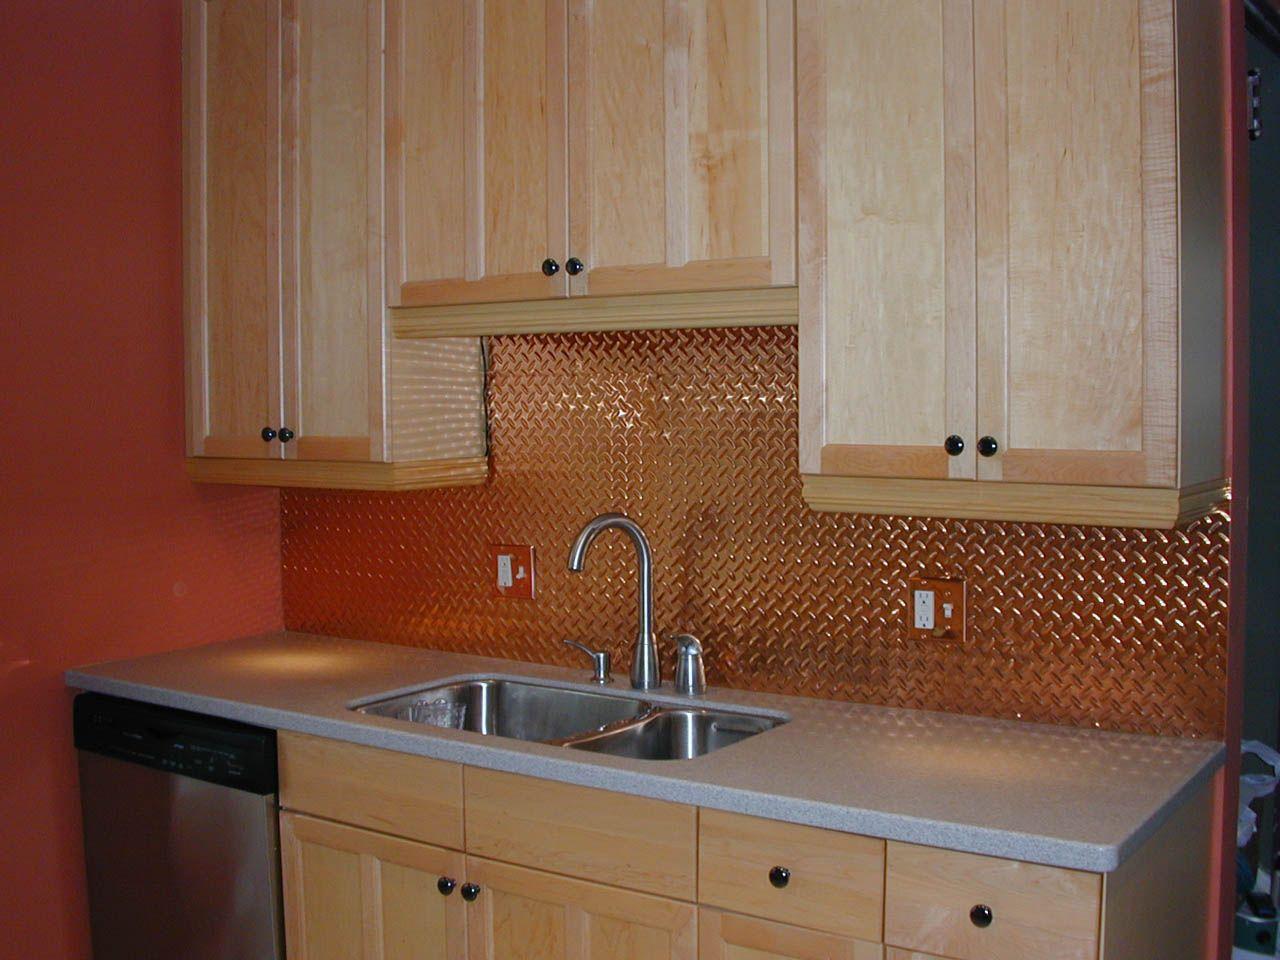 Metal Backsplash Buy Armor Decorative Metal Tin Kitchen Backsplashes Tin Ceiling